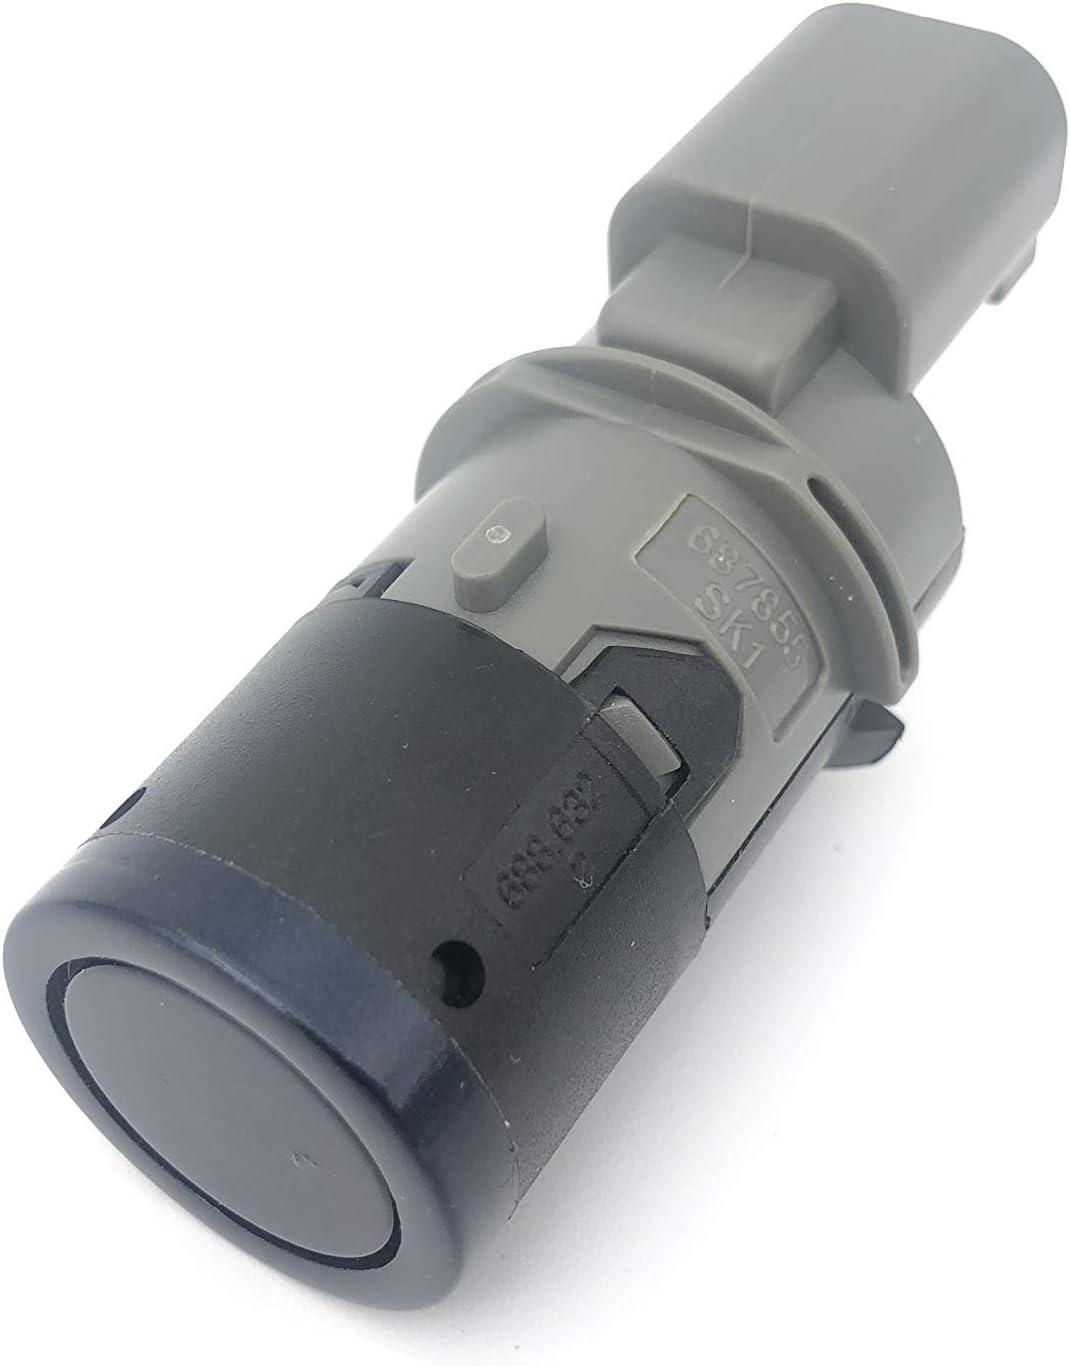 tiefsee-blau a76 Vorne Parksensor f/ür BMW E60 E61 E63 E64 LCI 5er 6er 2002-2010 Lackierter PDC Einparkhilfe Ultraschallsensor Parktronic Parking Sensor